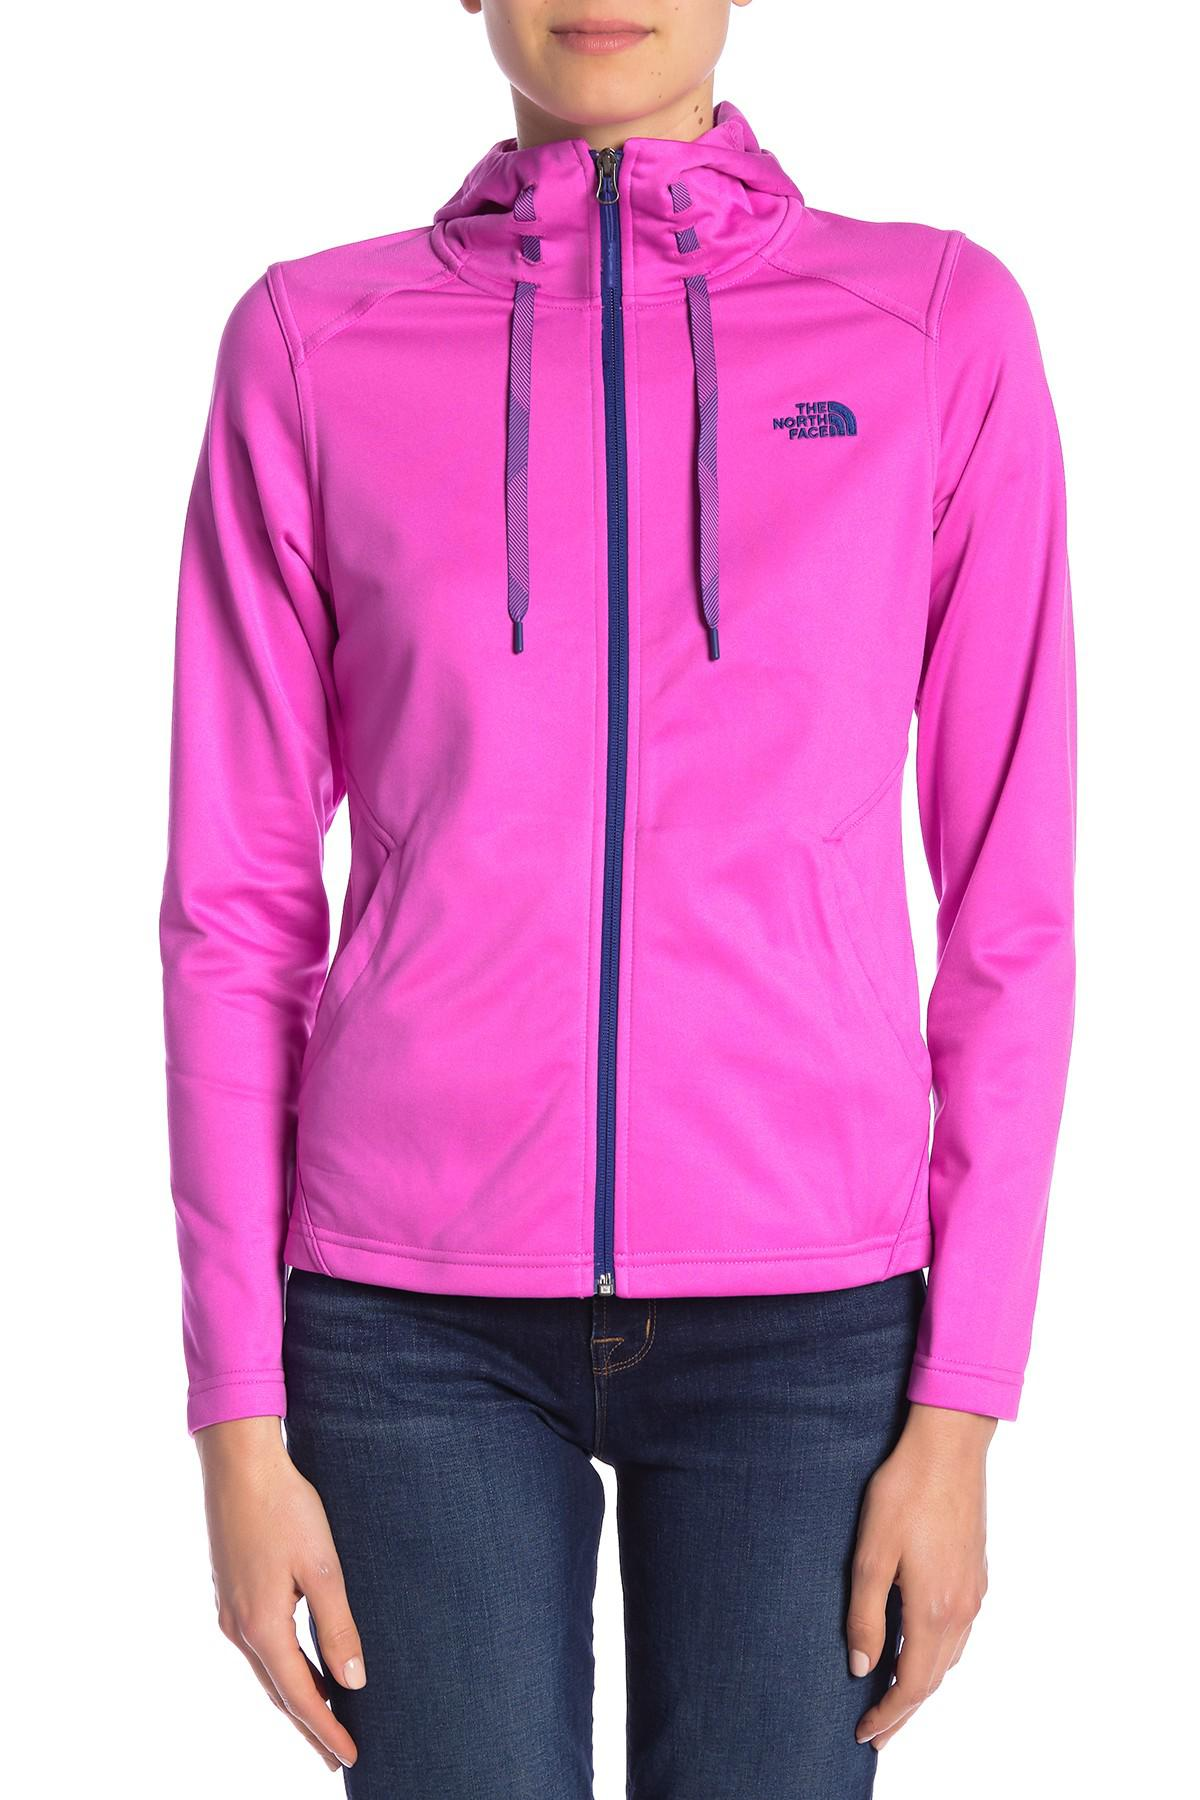 The North Face Synthetic Tech Mezzaluna Full Zip Hoodie Jacket in Pink - Lyst